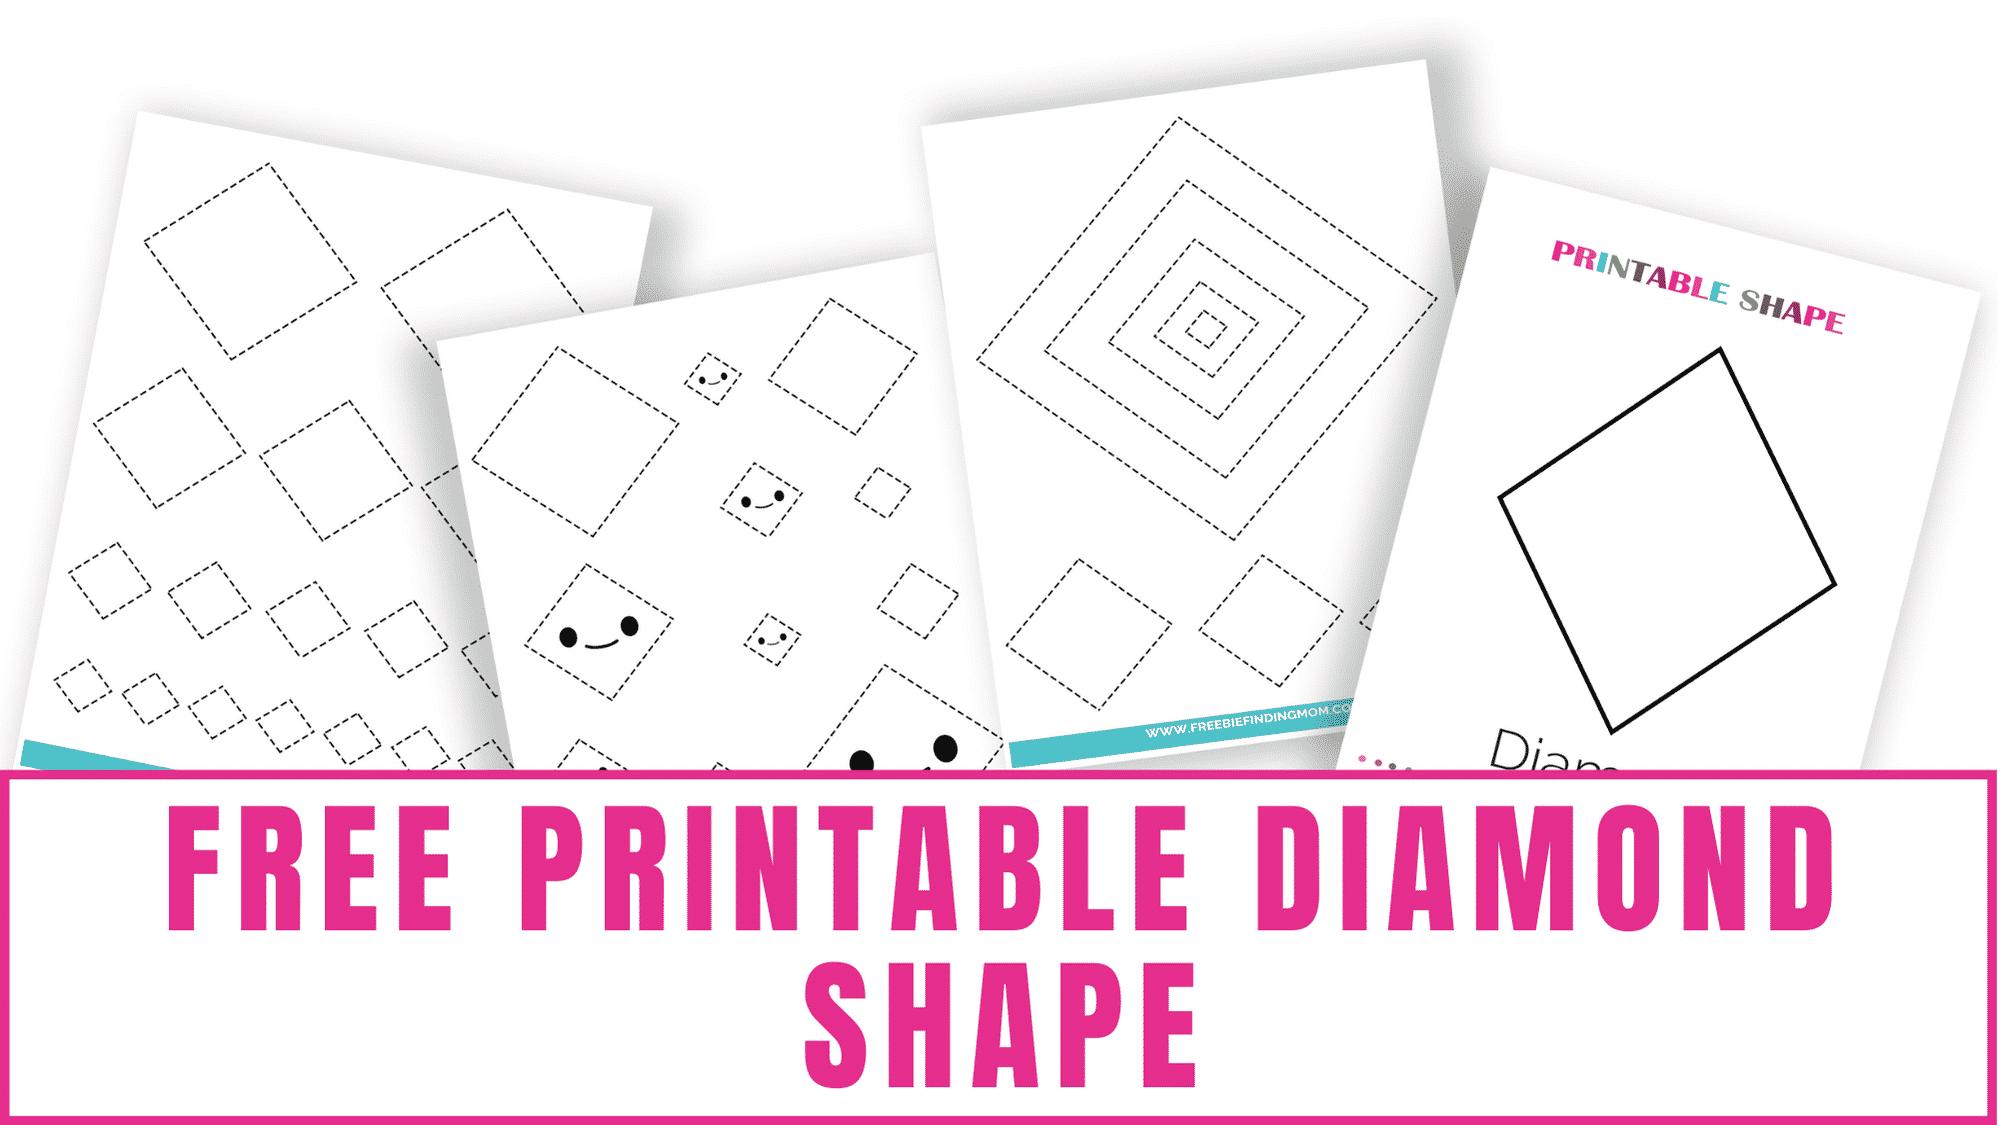 Need help drawing the perfect diamond? Trace this free printable diamond shape to help.